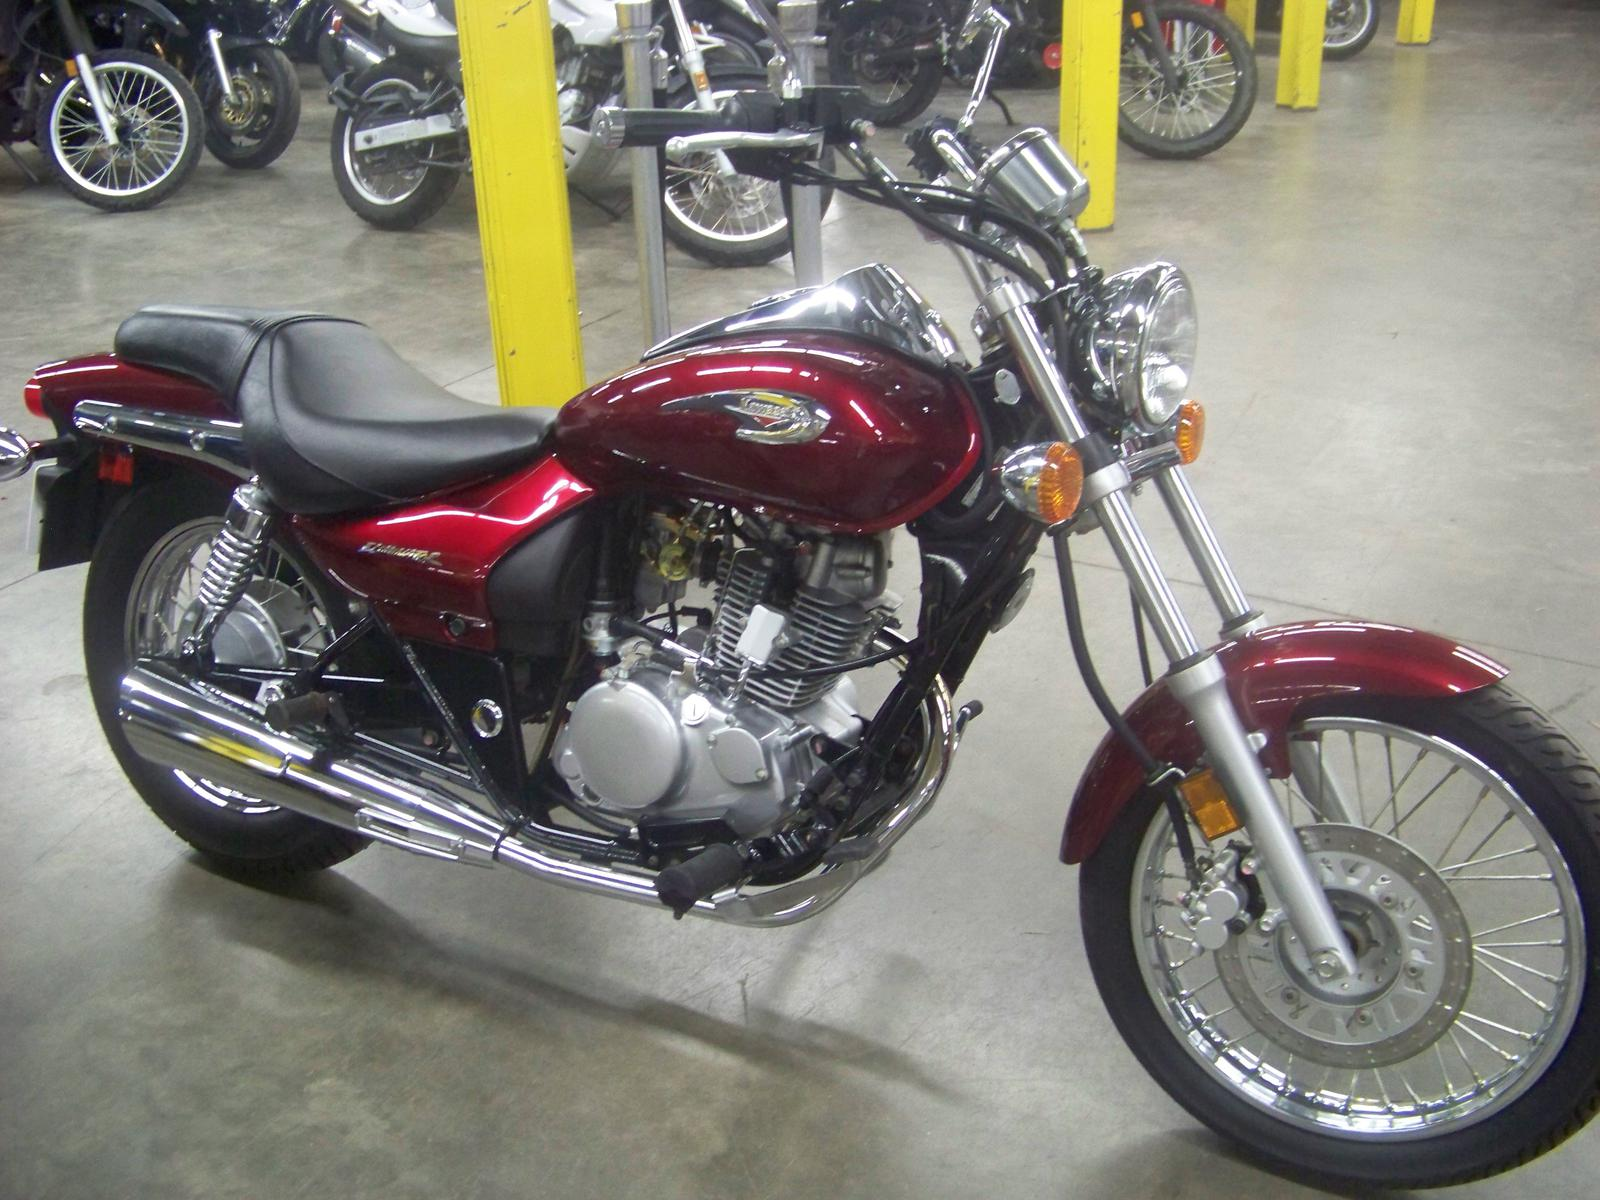 2001 Kawasaki ELIMINATOR 125 for sale in Lakeville, MN. Leo's South ...